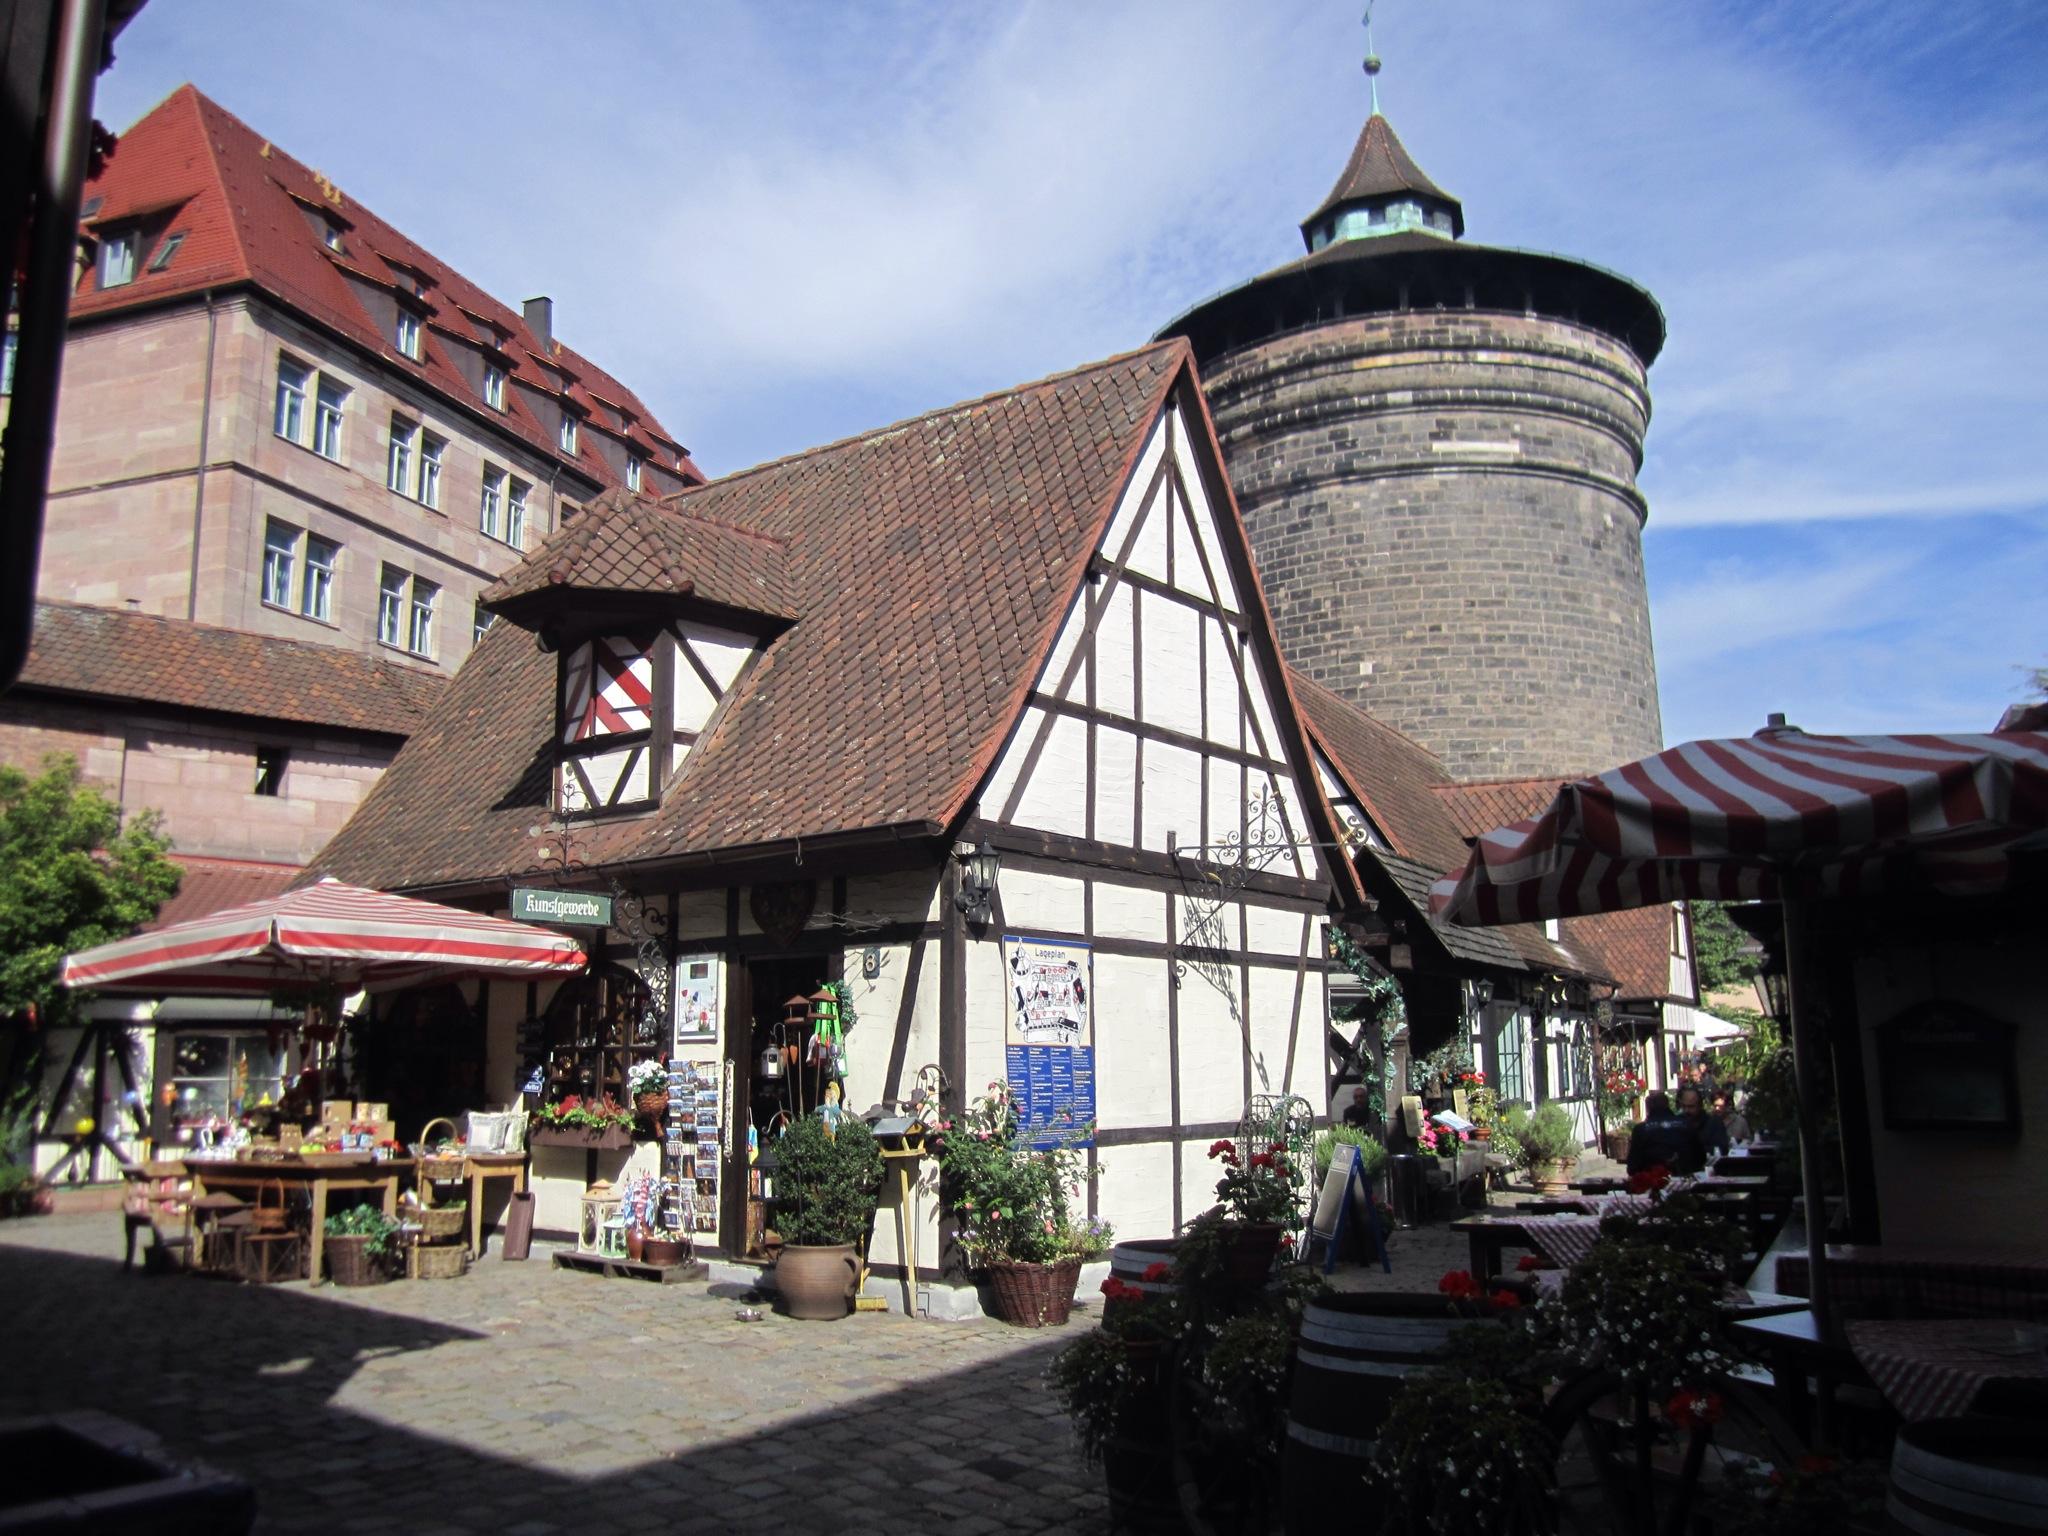 Old World Village Huntington Beach California Img 3223 Jpg Wandering Nürnberg